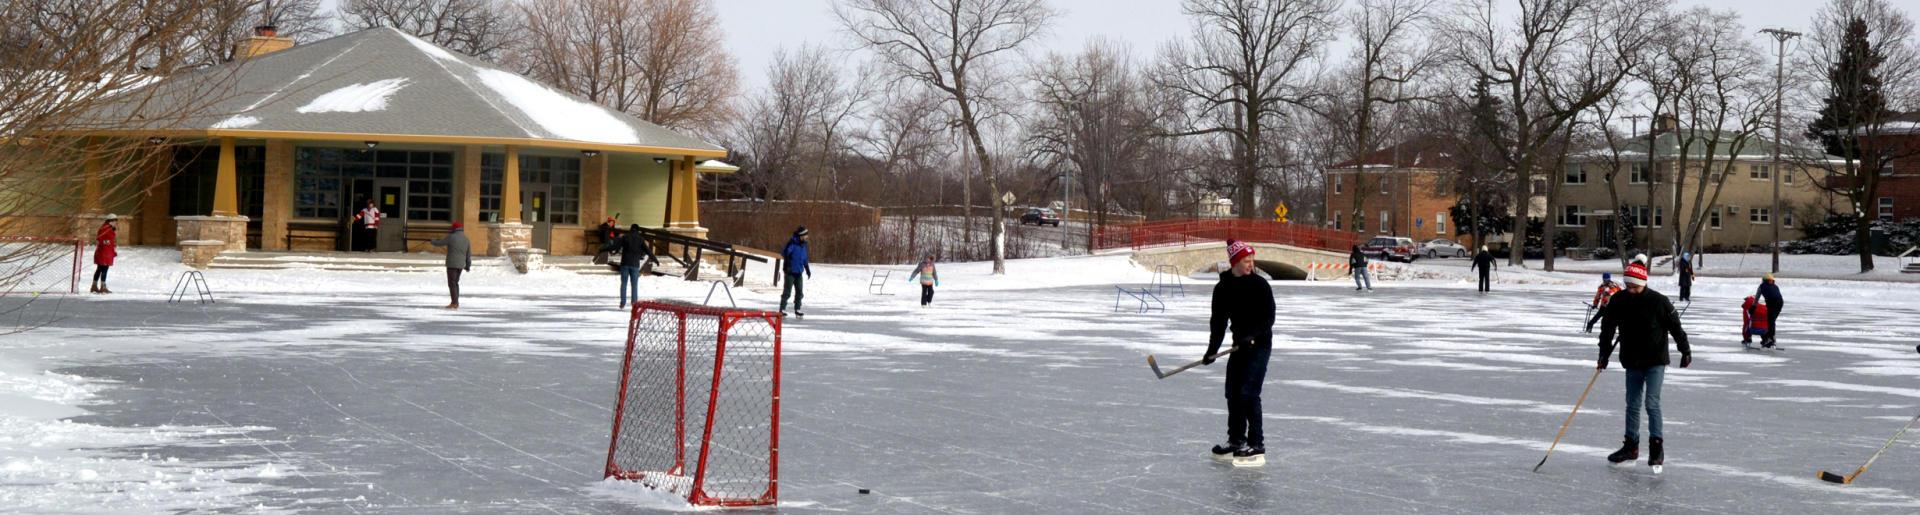 Tenney Park Ice Skating